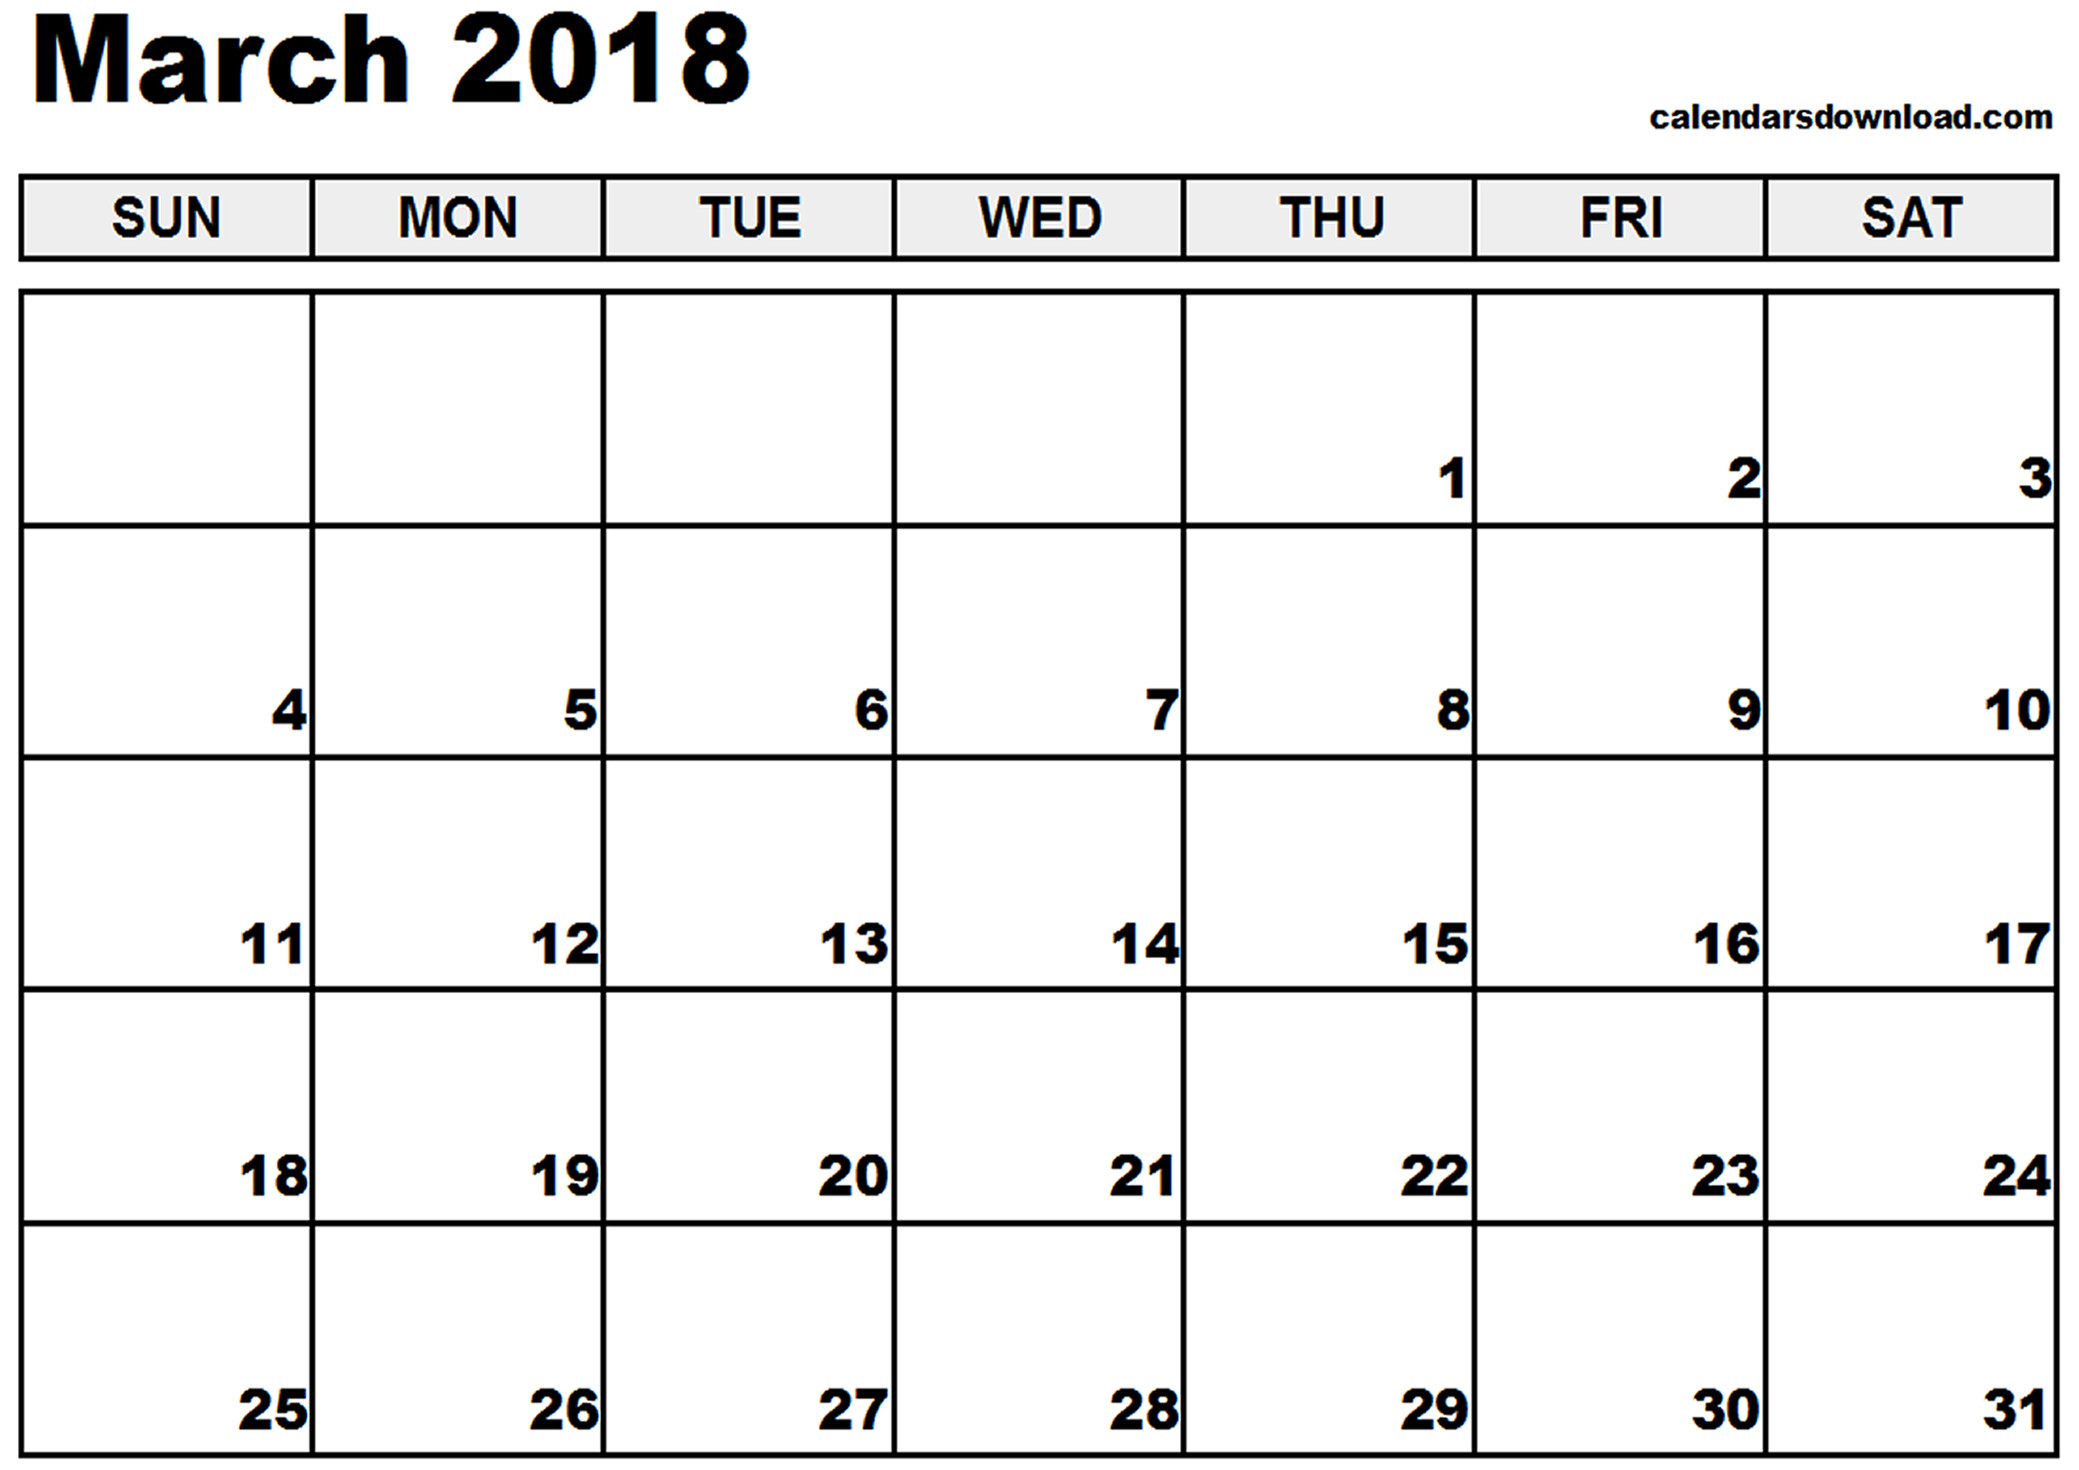 wallpaper calendar march 2018 73 images